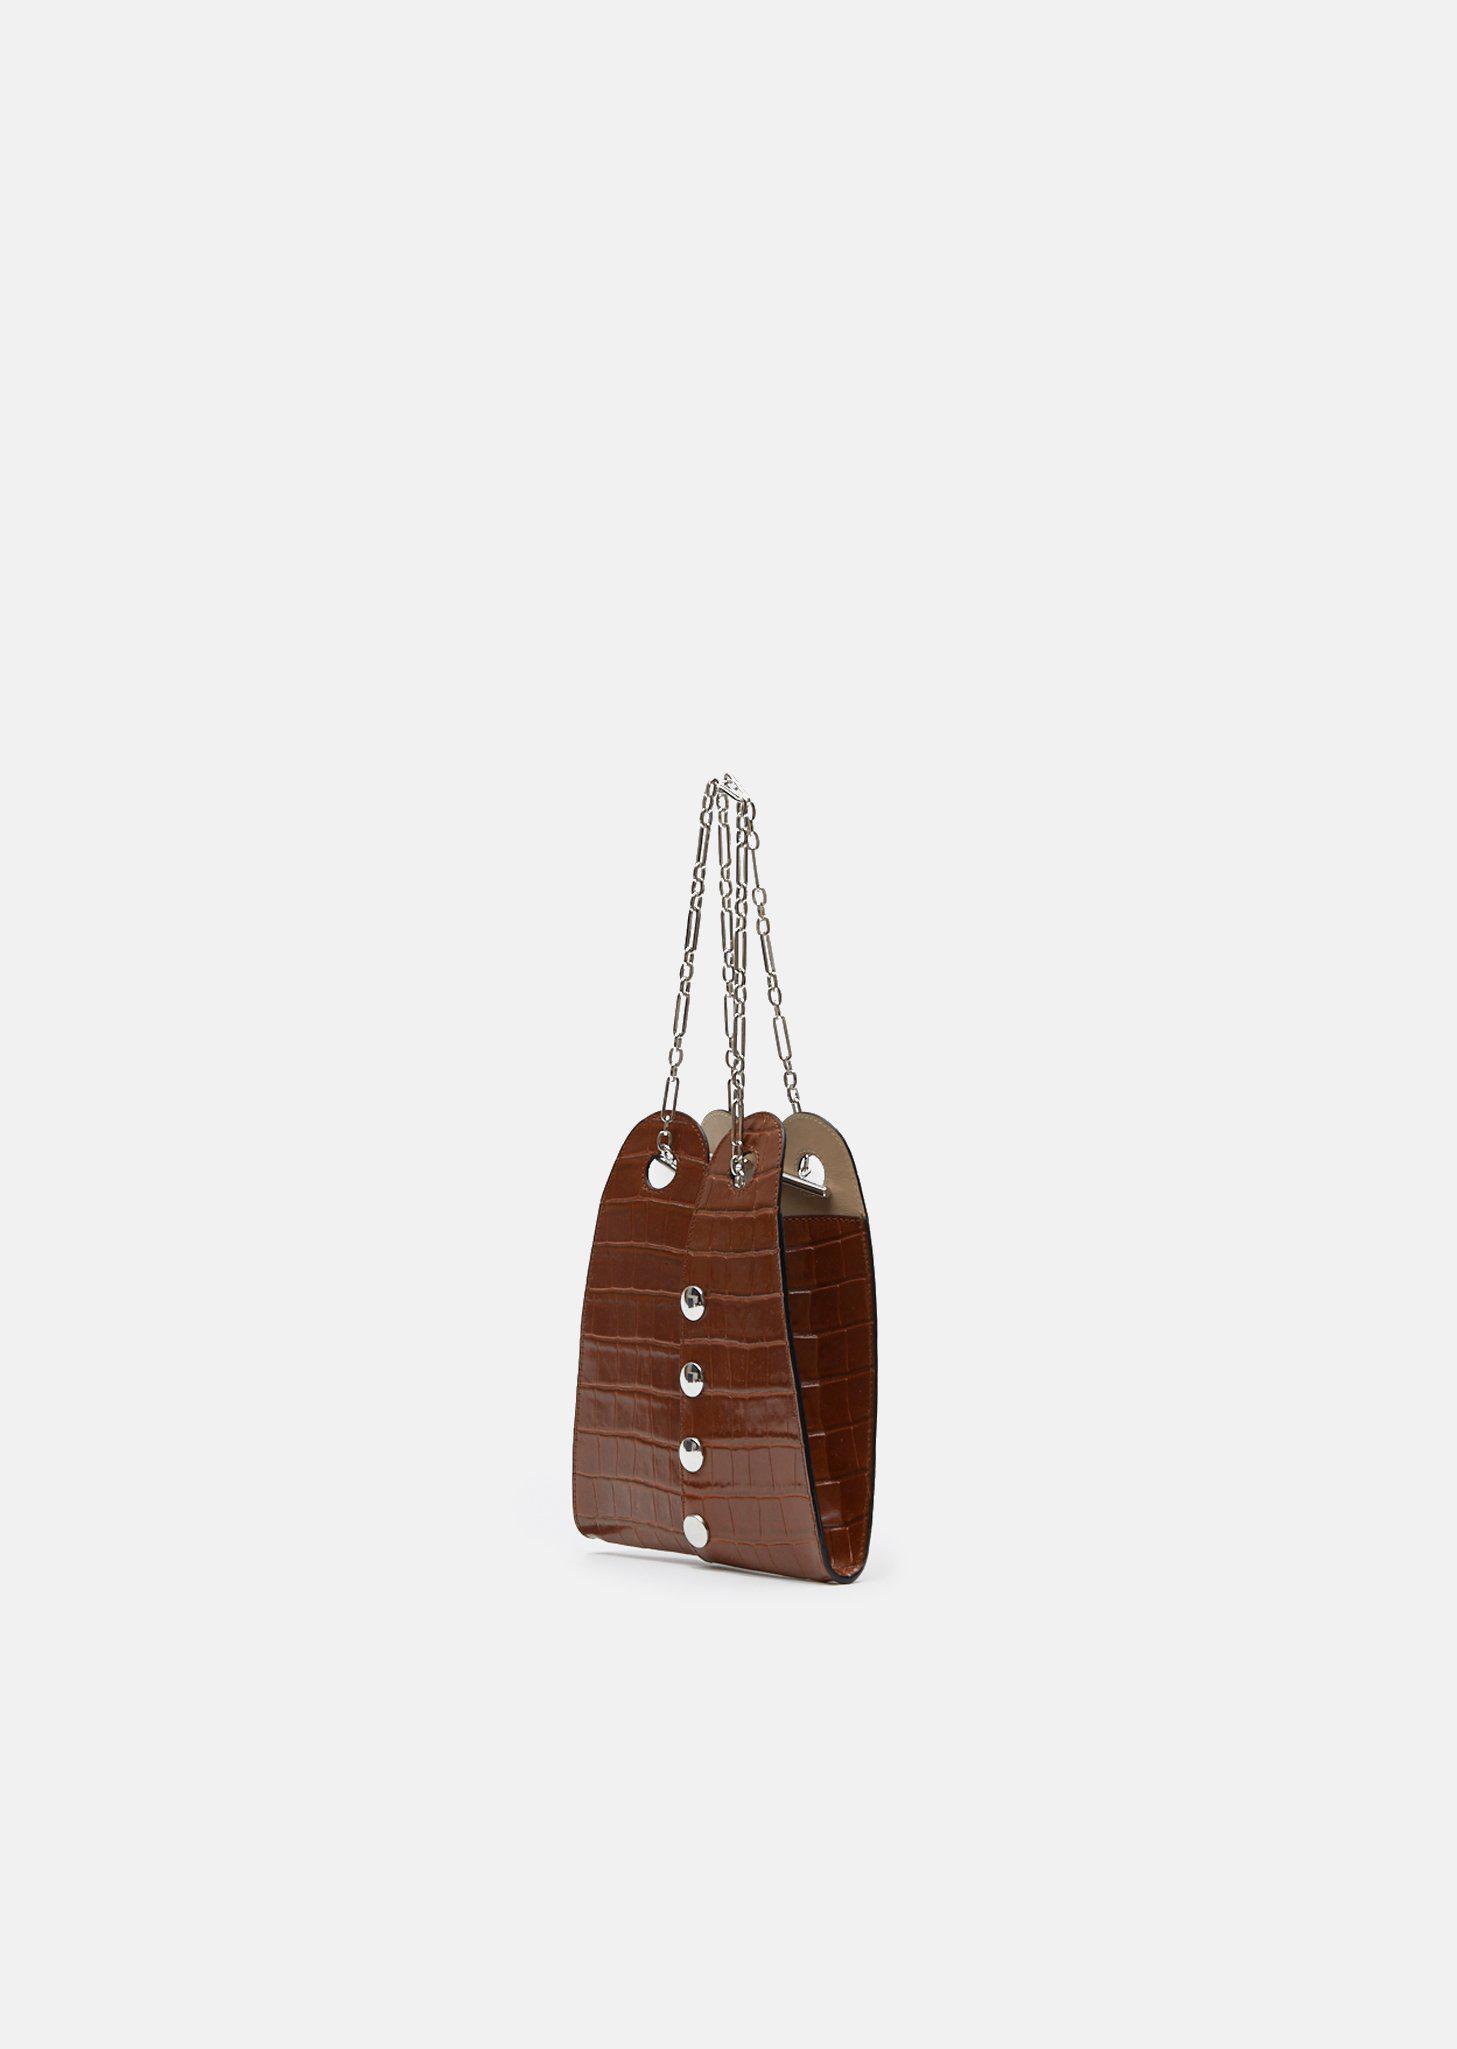 af8c390c892 Lemaire Brown Mini Double Folded Bag